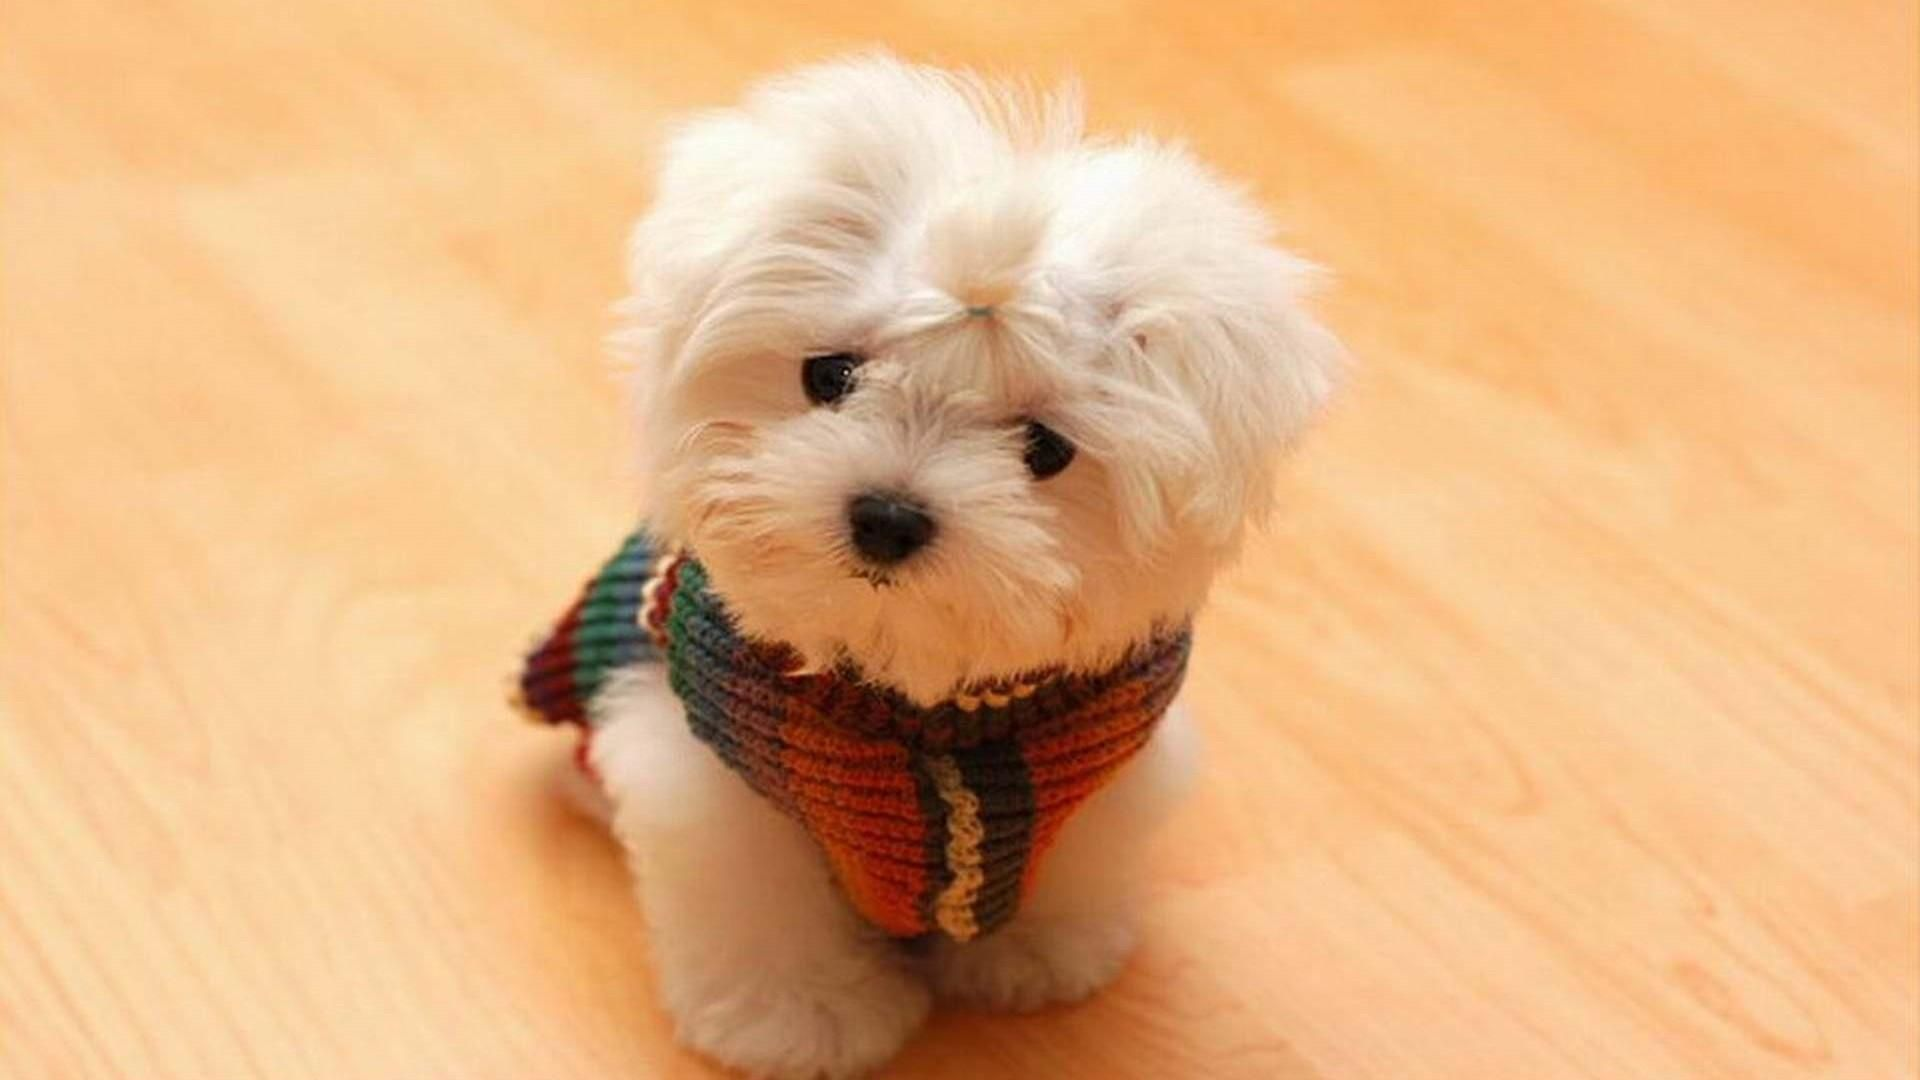 Cute Dog Wallpapers Desktop Mobile 29 Cute Animals Fluffy